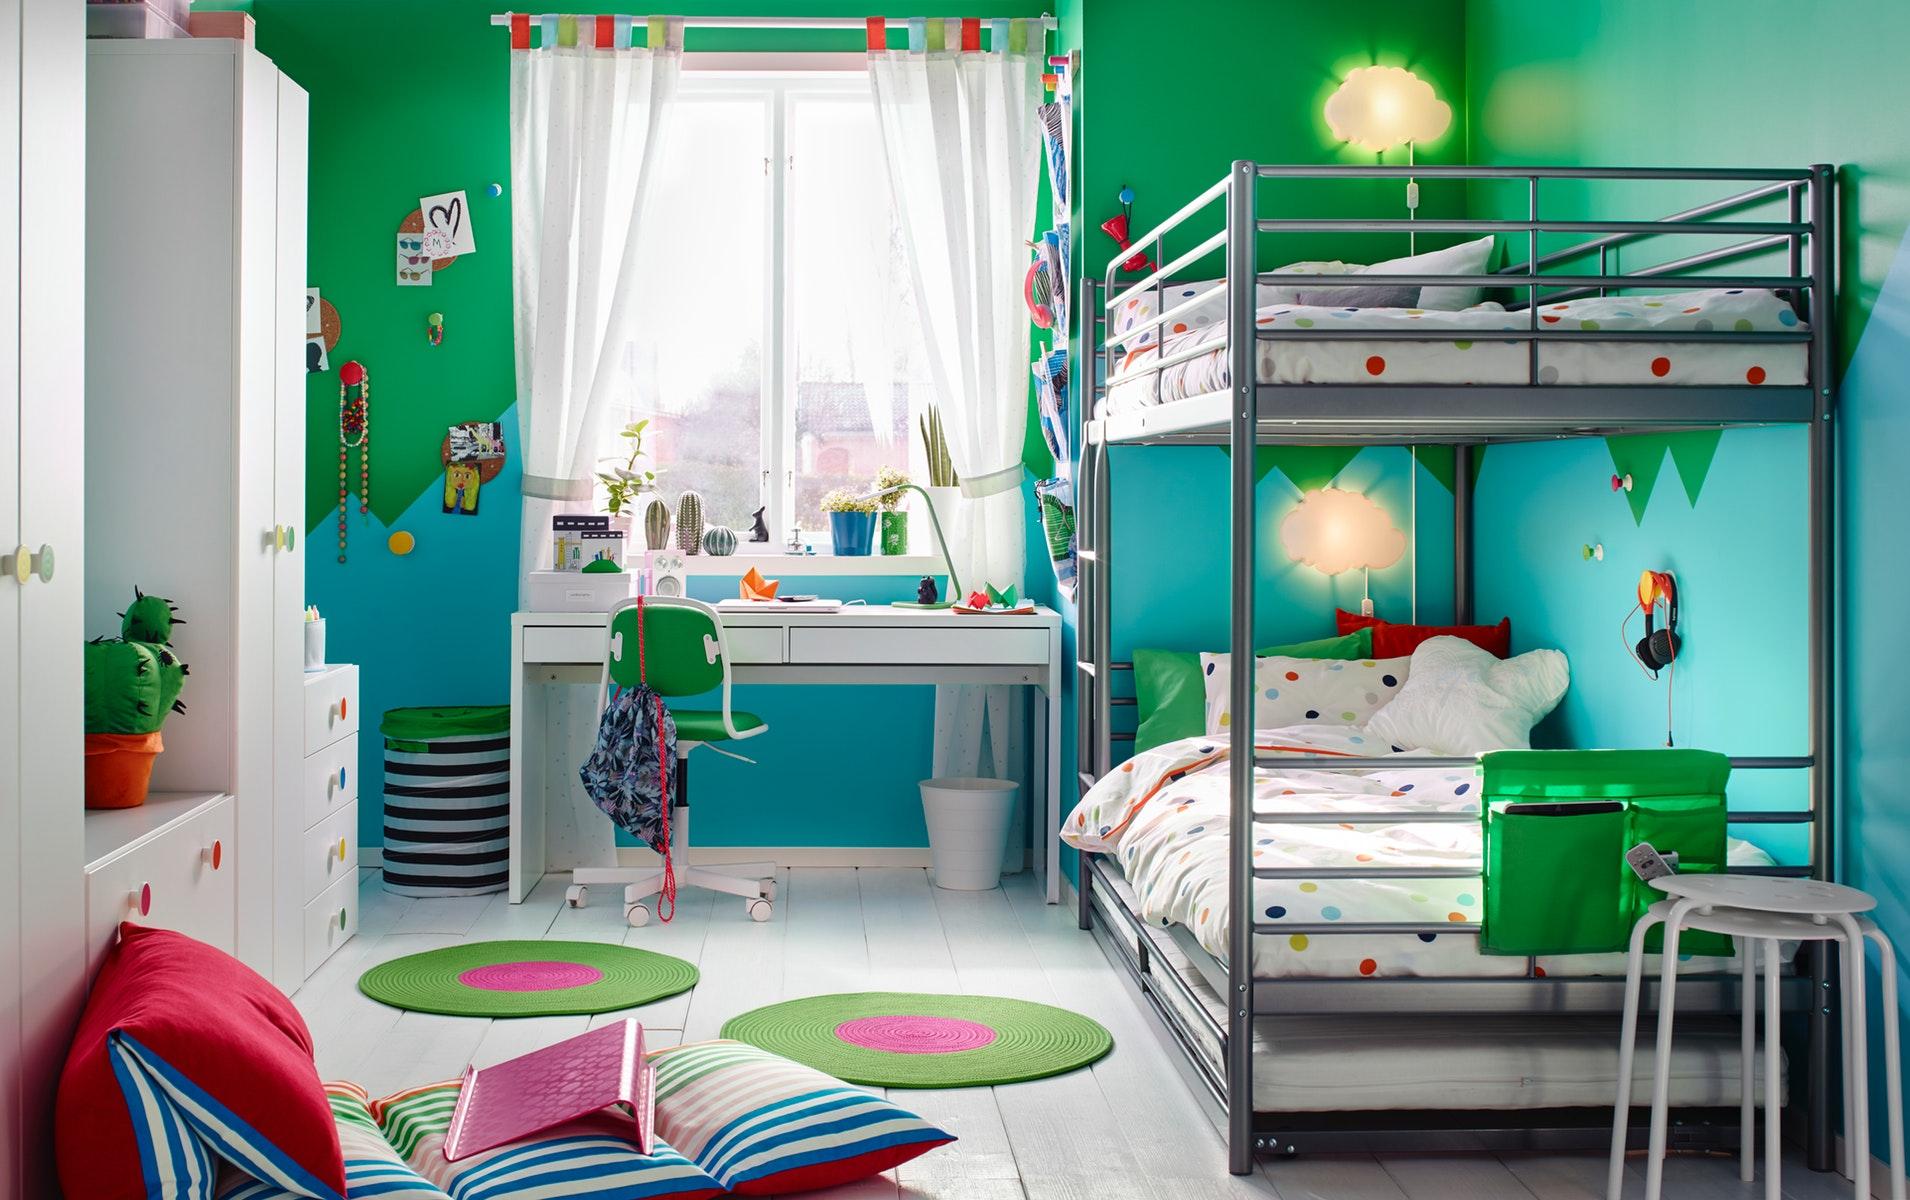 Tempat tidur tinggi